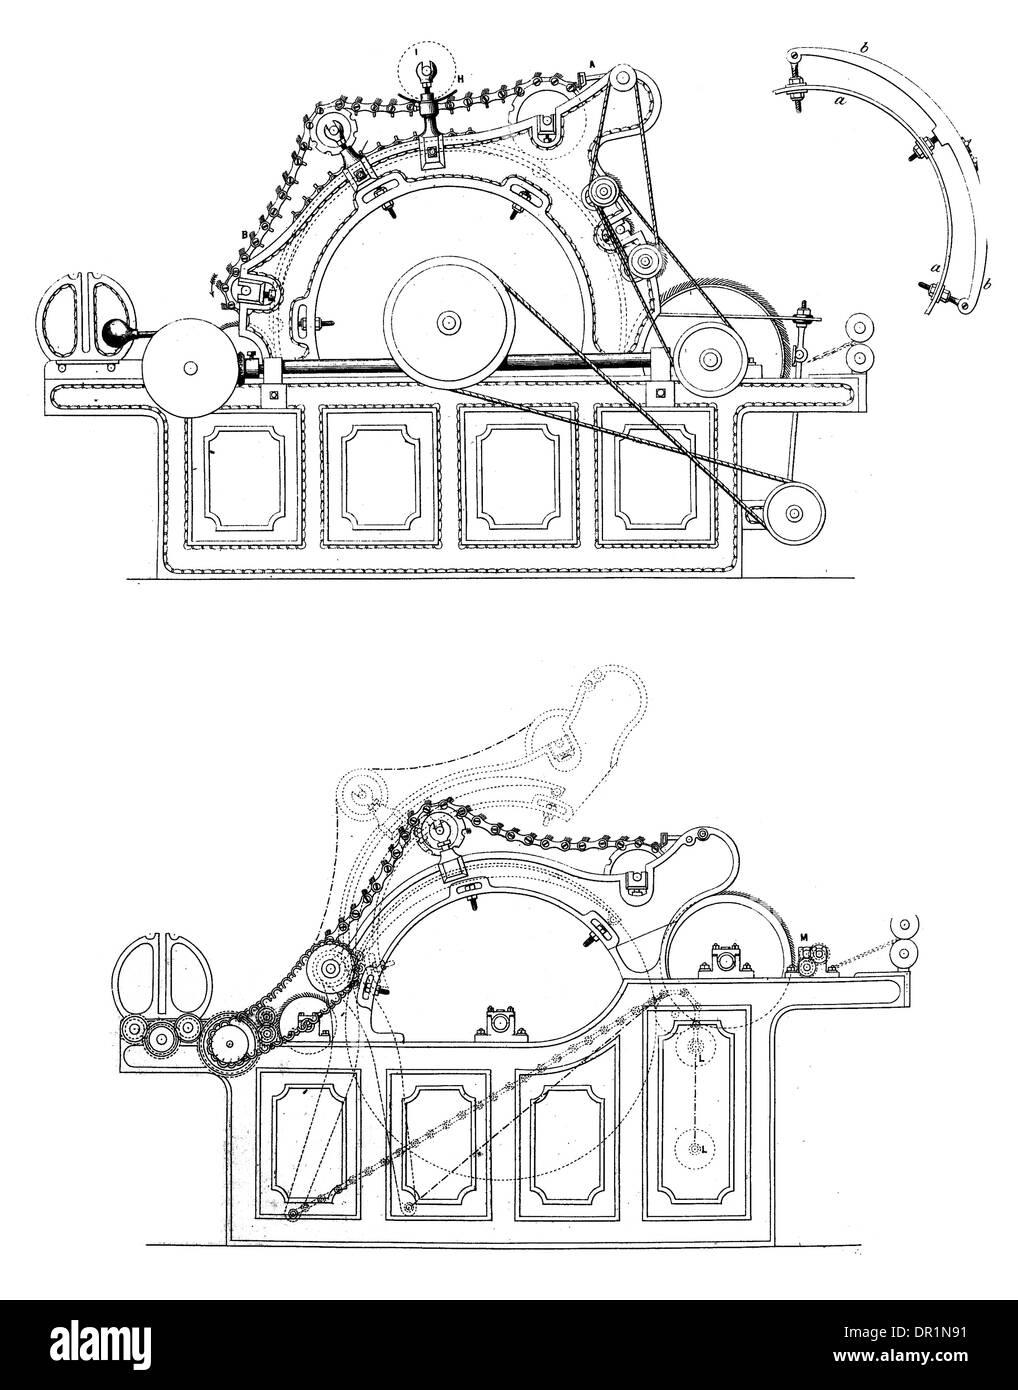 Leich patente Auto Motor pelado circa 1889 Foto de stock